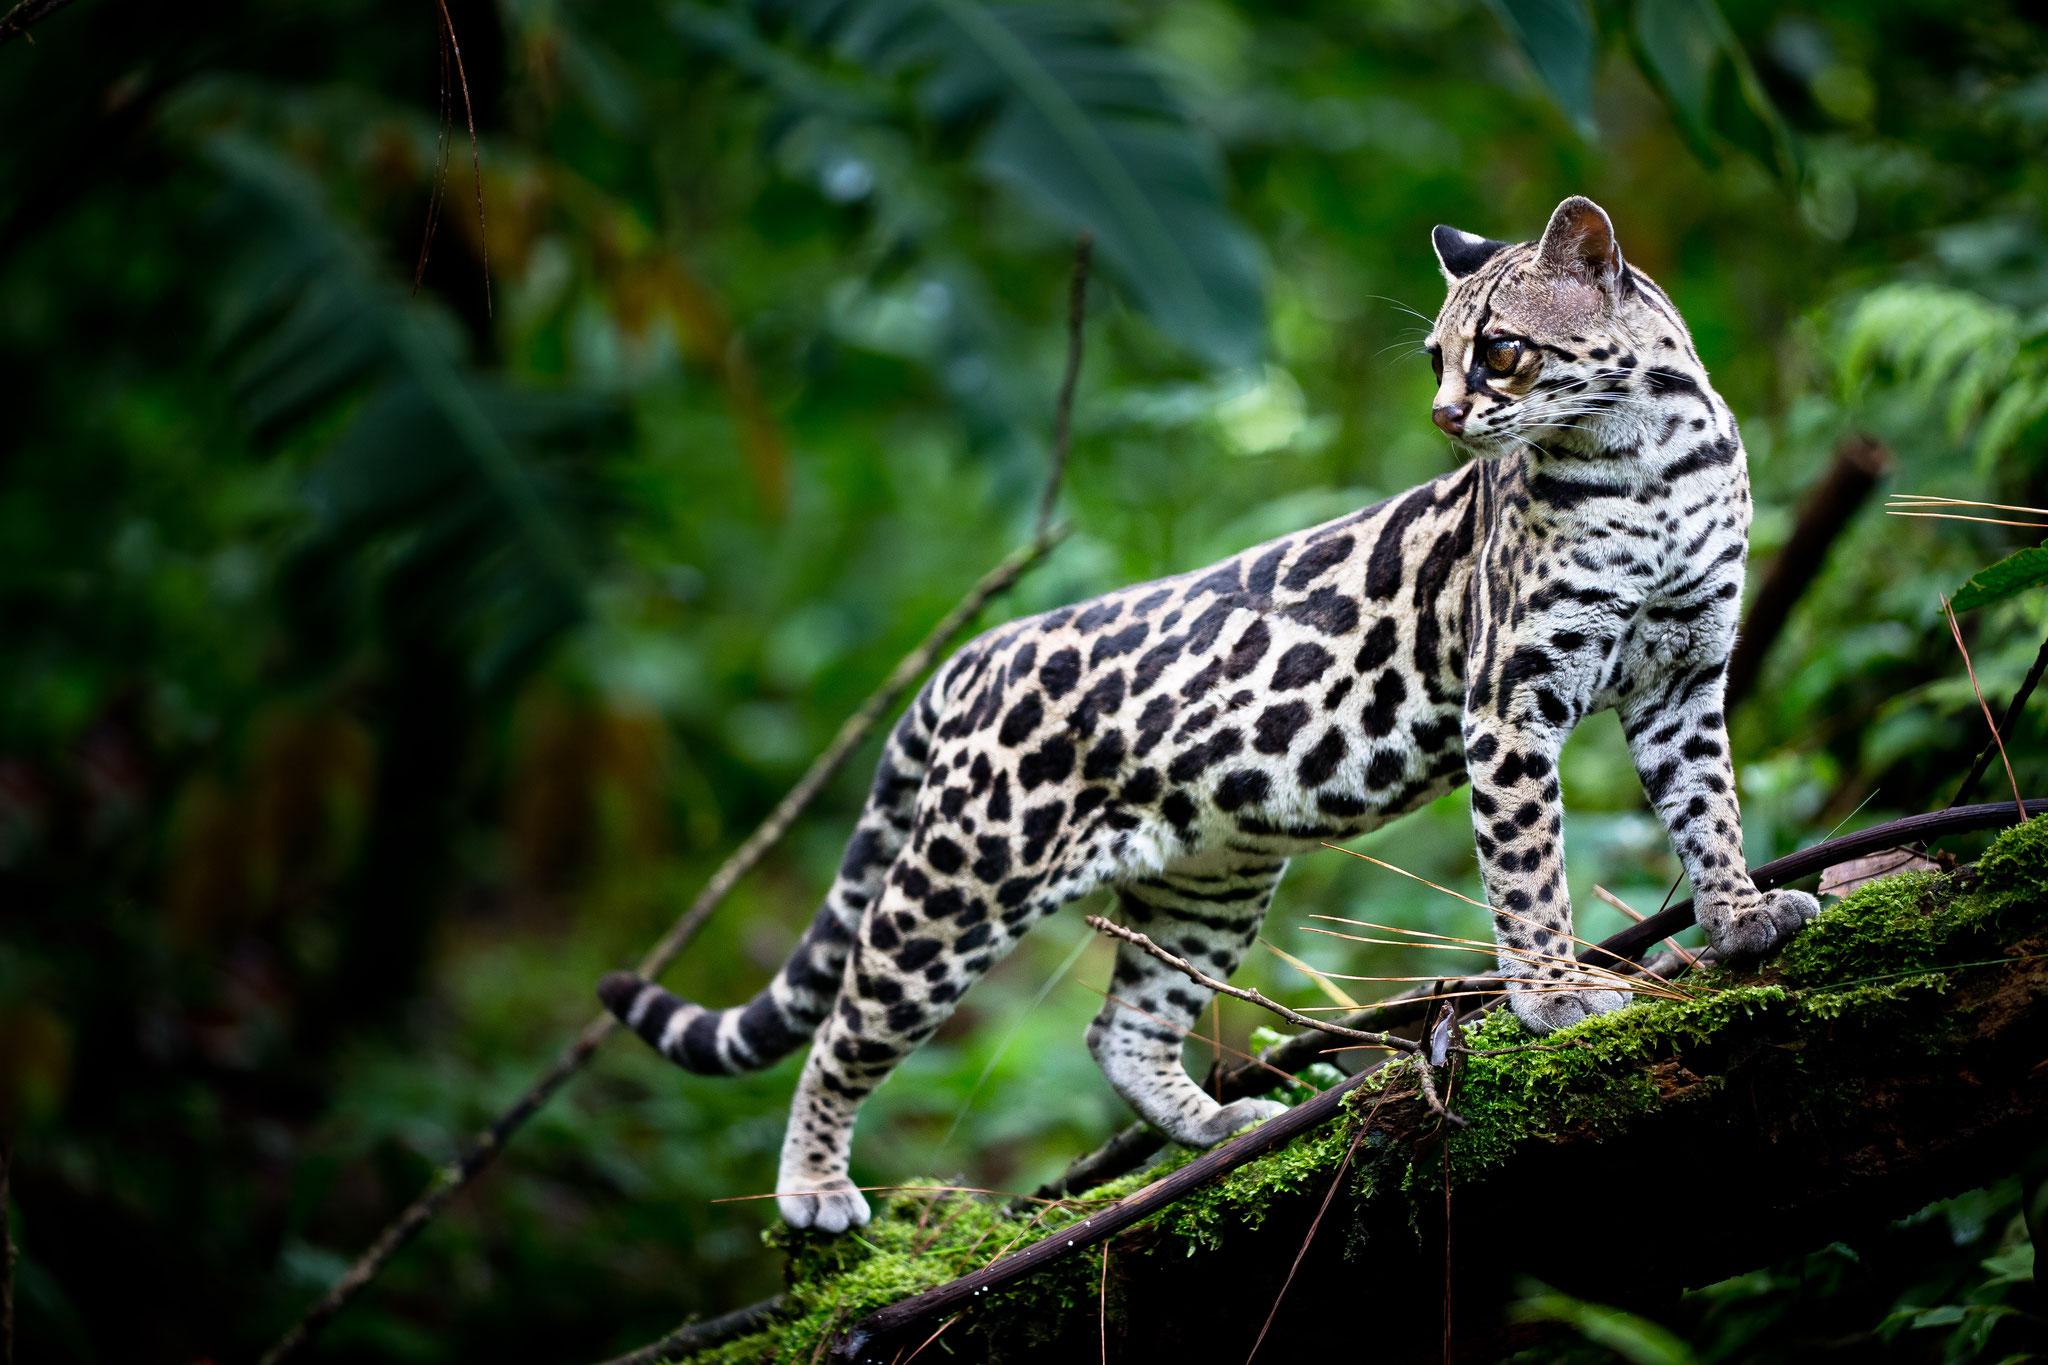 Ocelot Costa Rica @Pascal Jahan